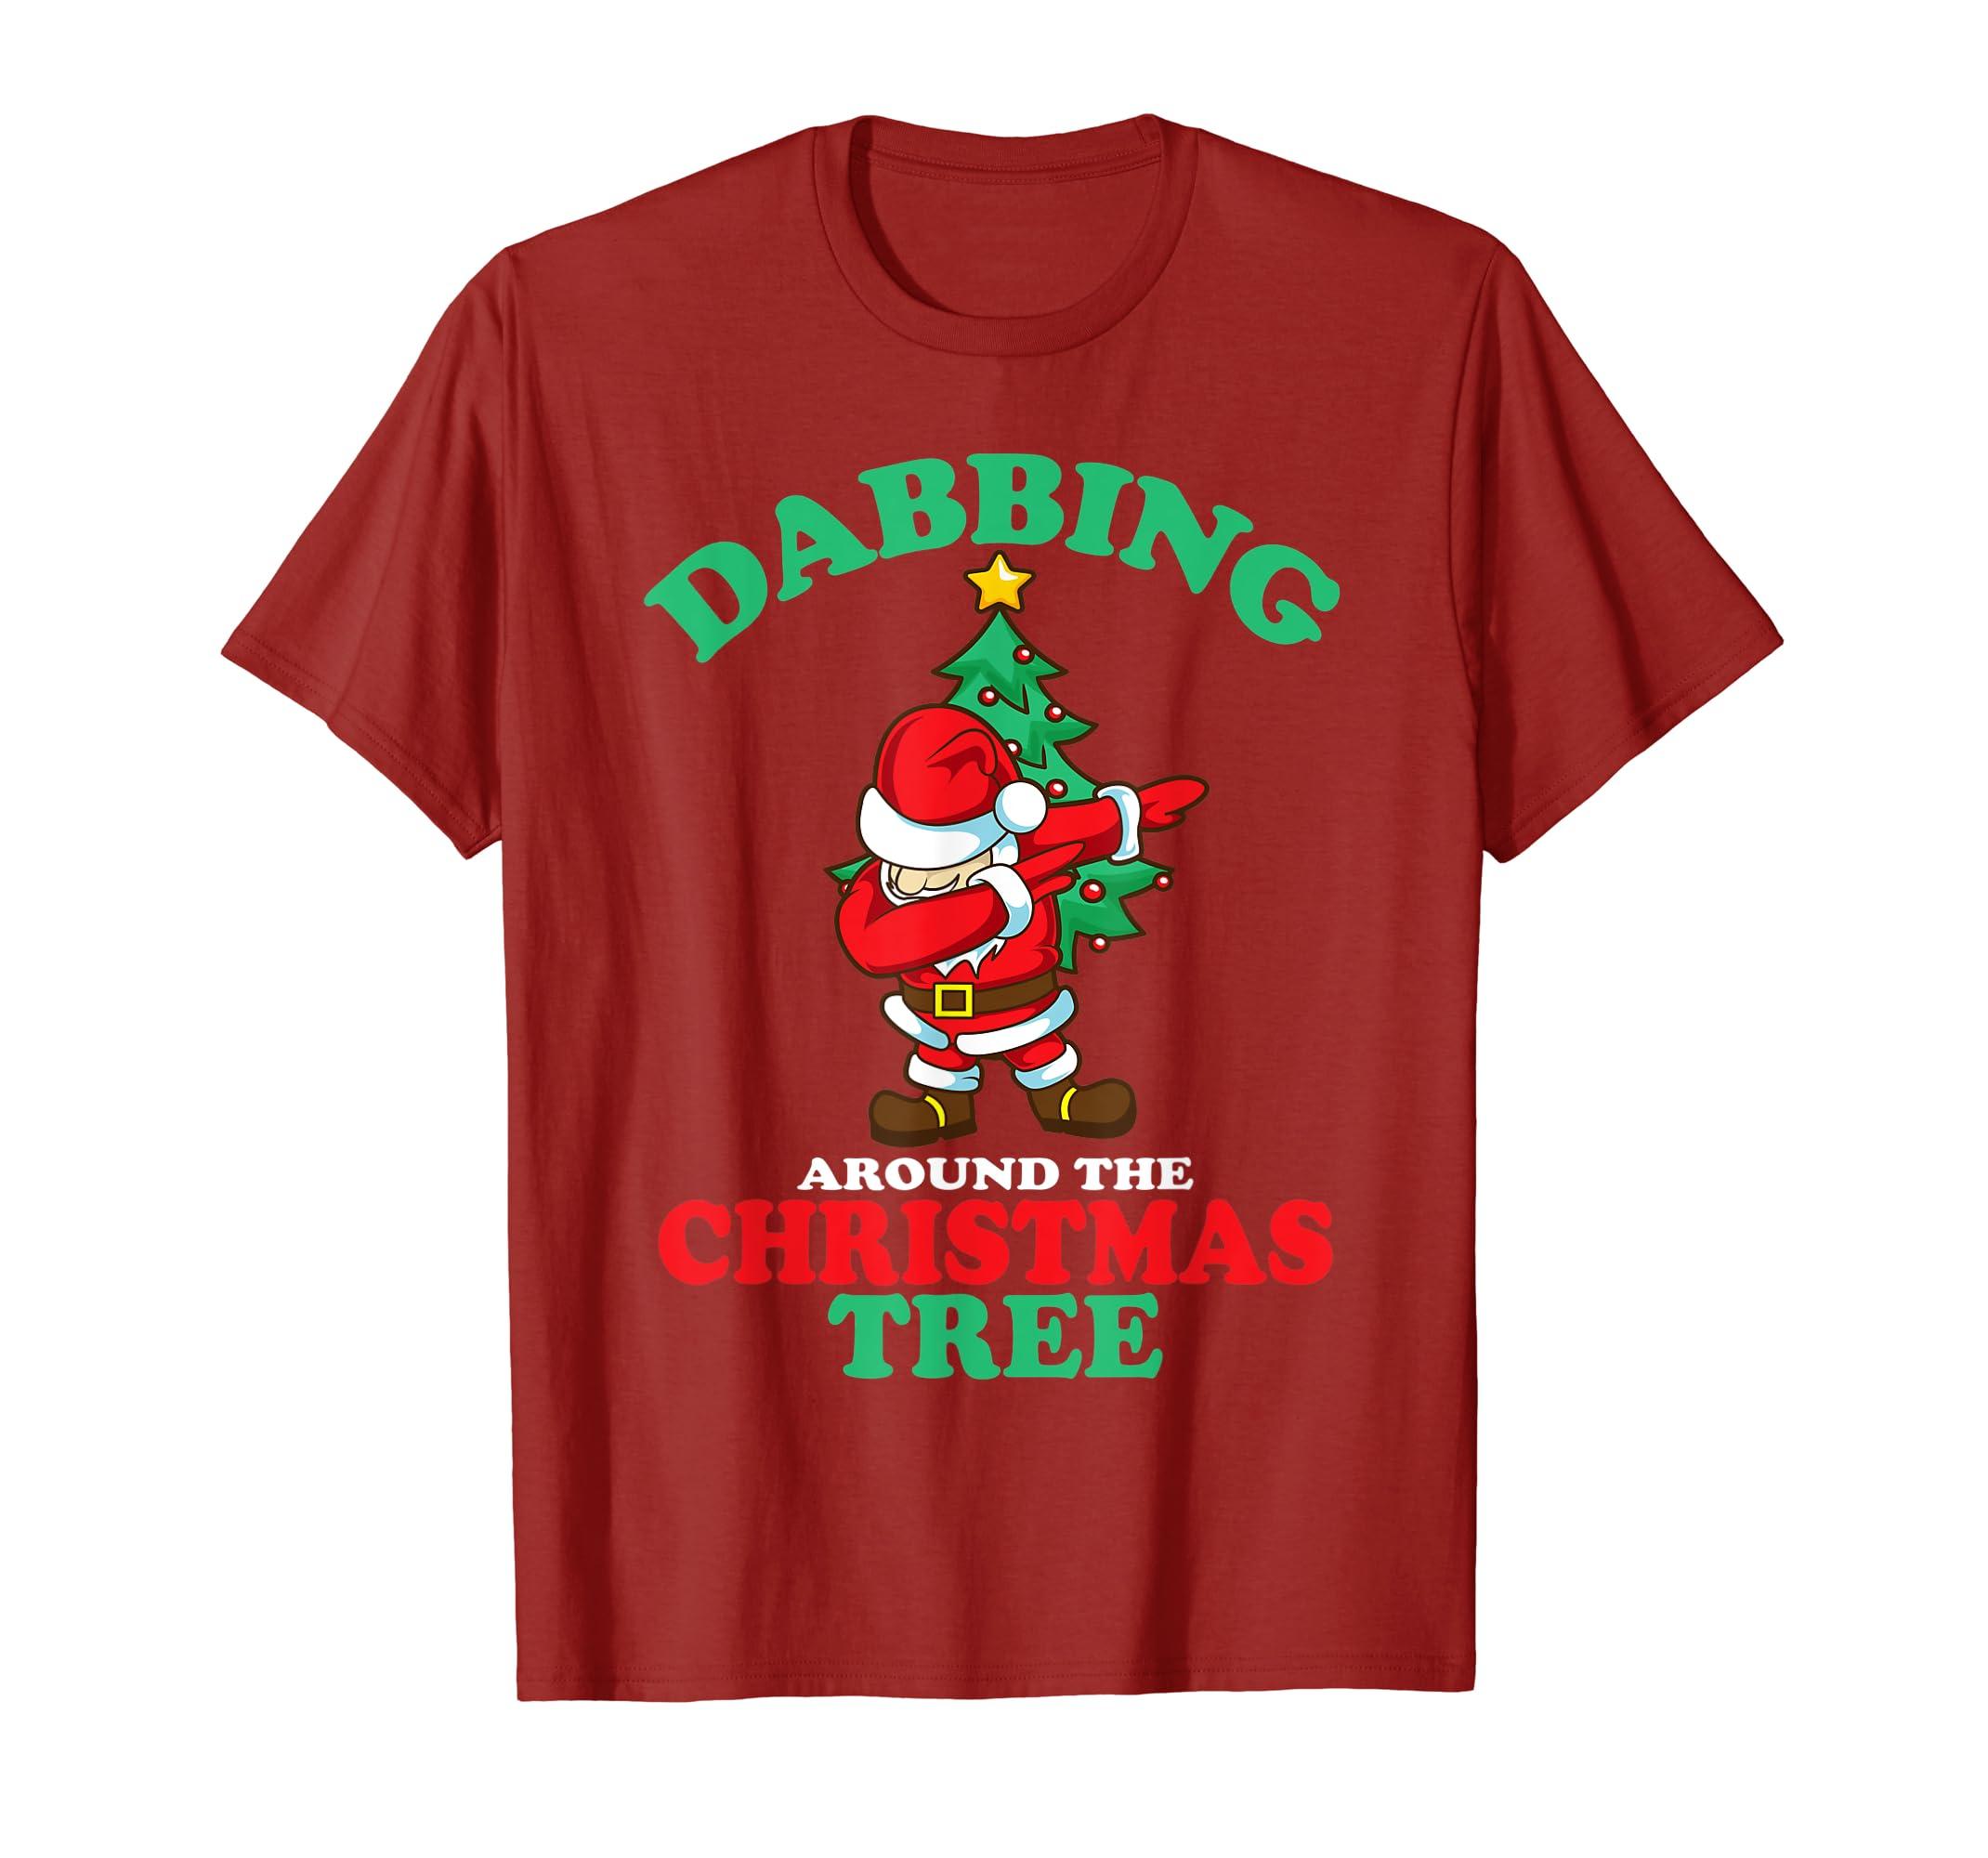 9cbe779ee Amazon.com: Dabbing Around The Christmas Tree Shirt Funny Santa Dab Song:  Clothing